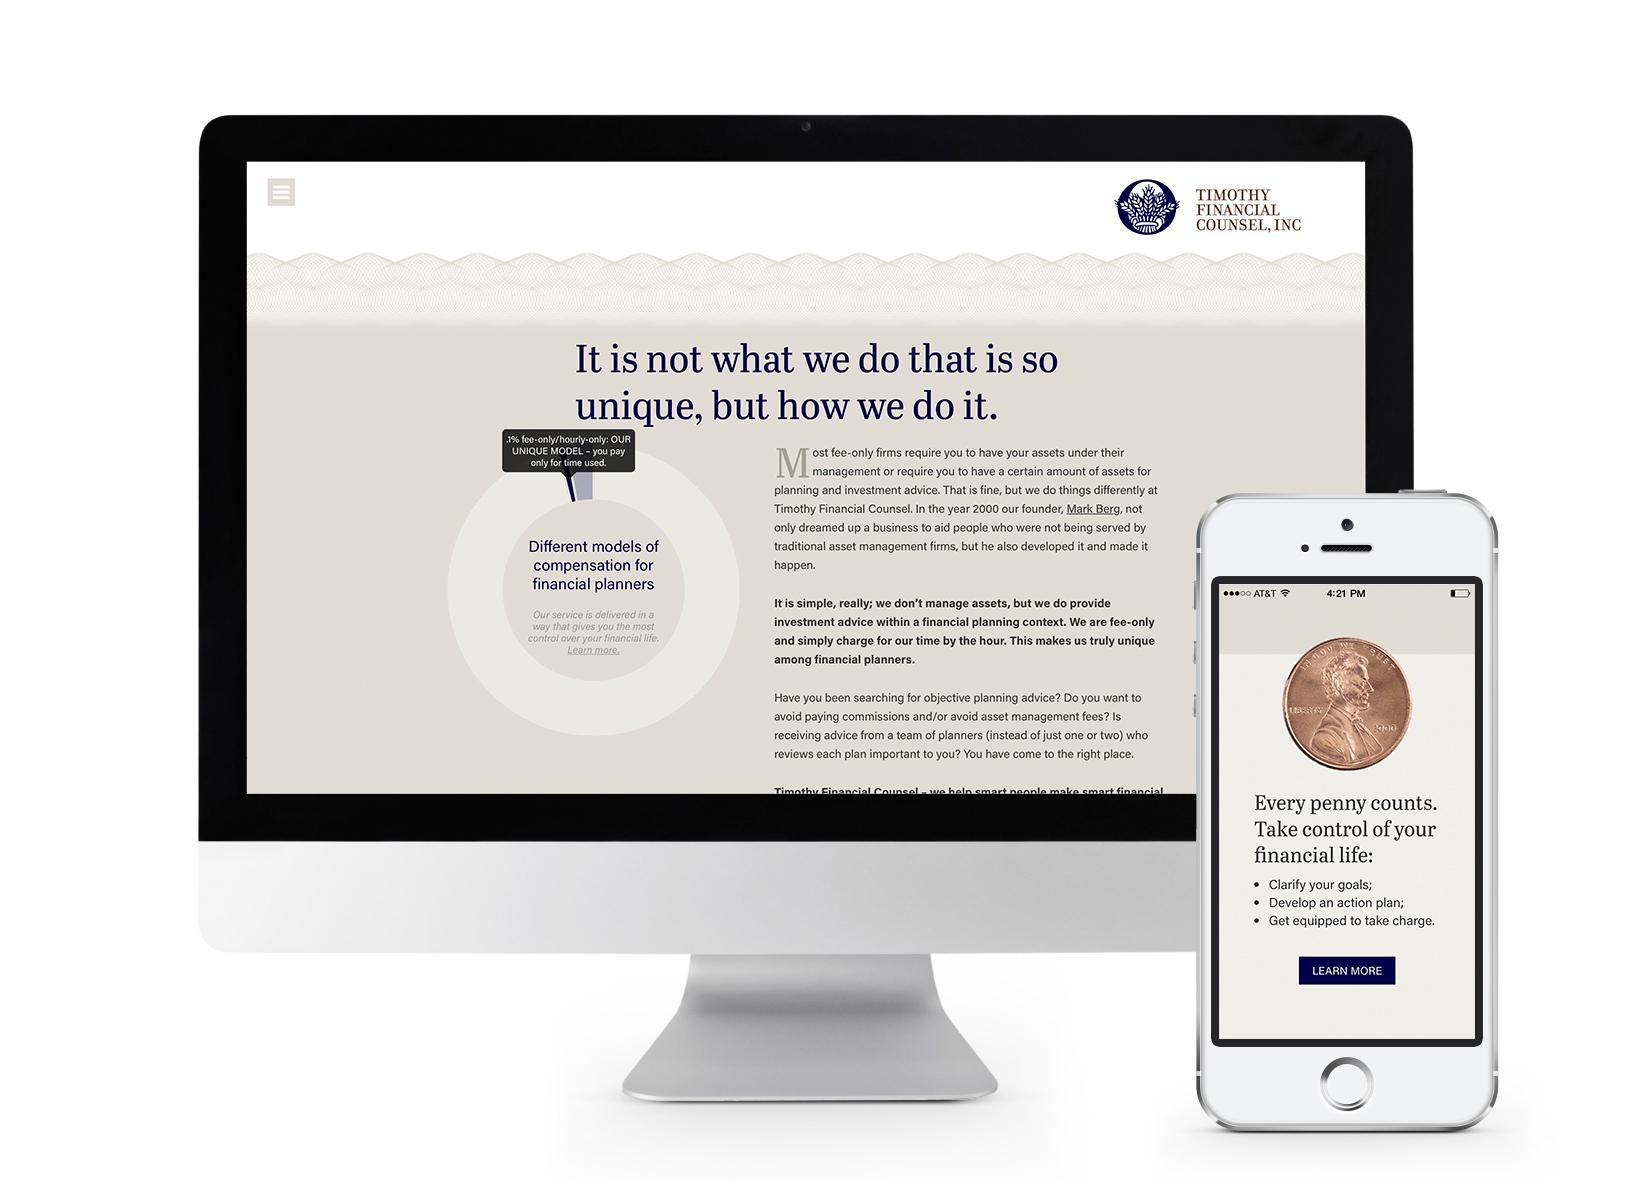 Responsive website design for financial planning firm